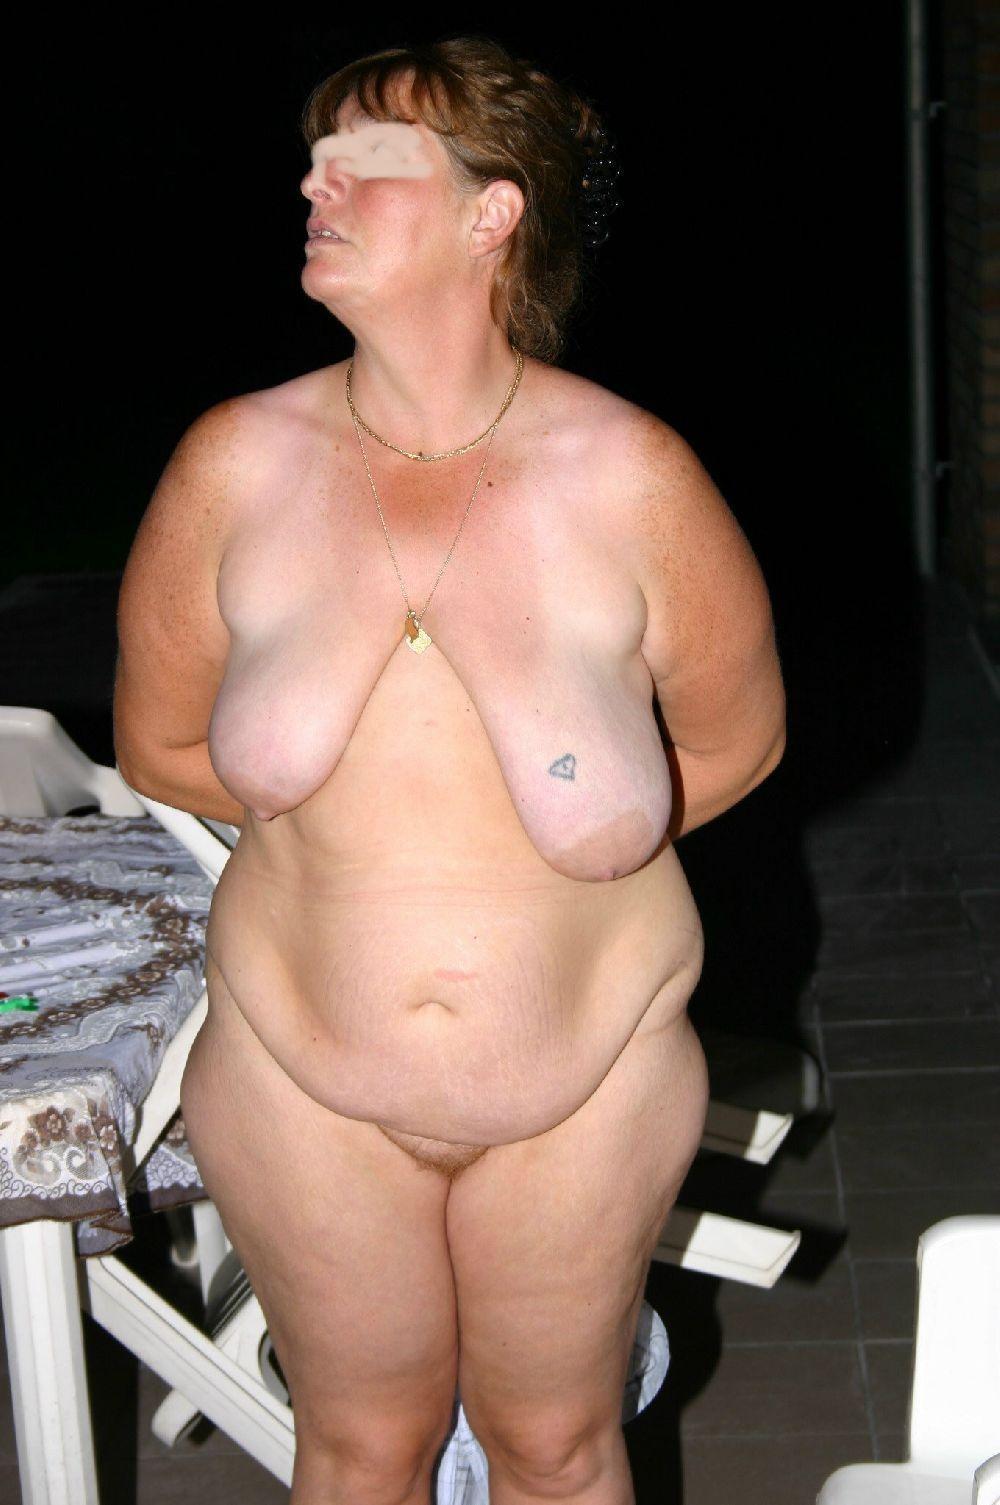 Ugly saggy deformed tits